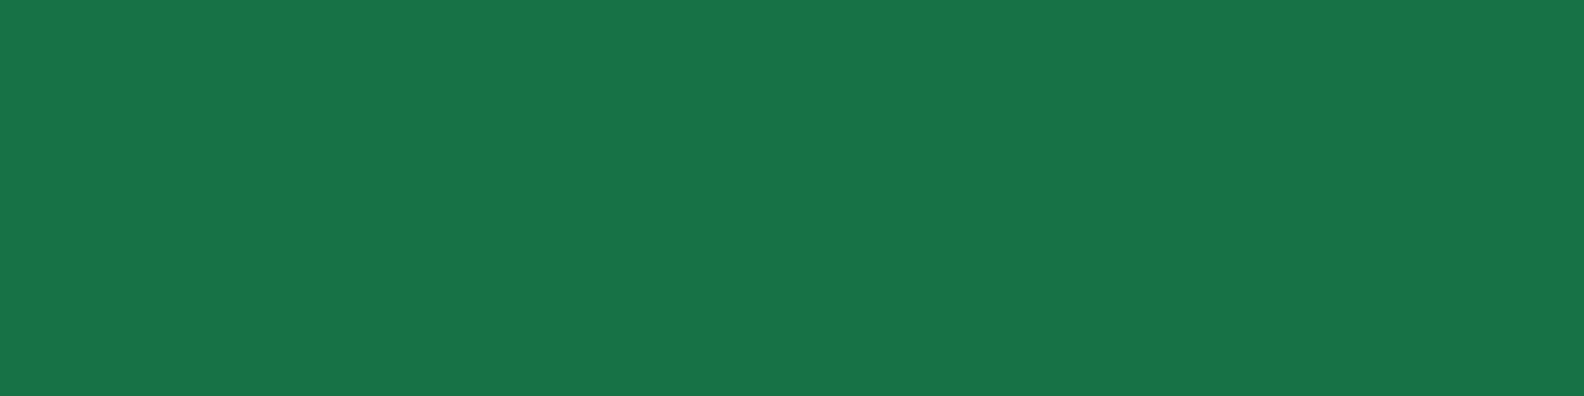 1584x396 Dark Spring Green Solid Color Background